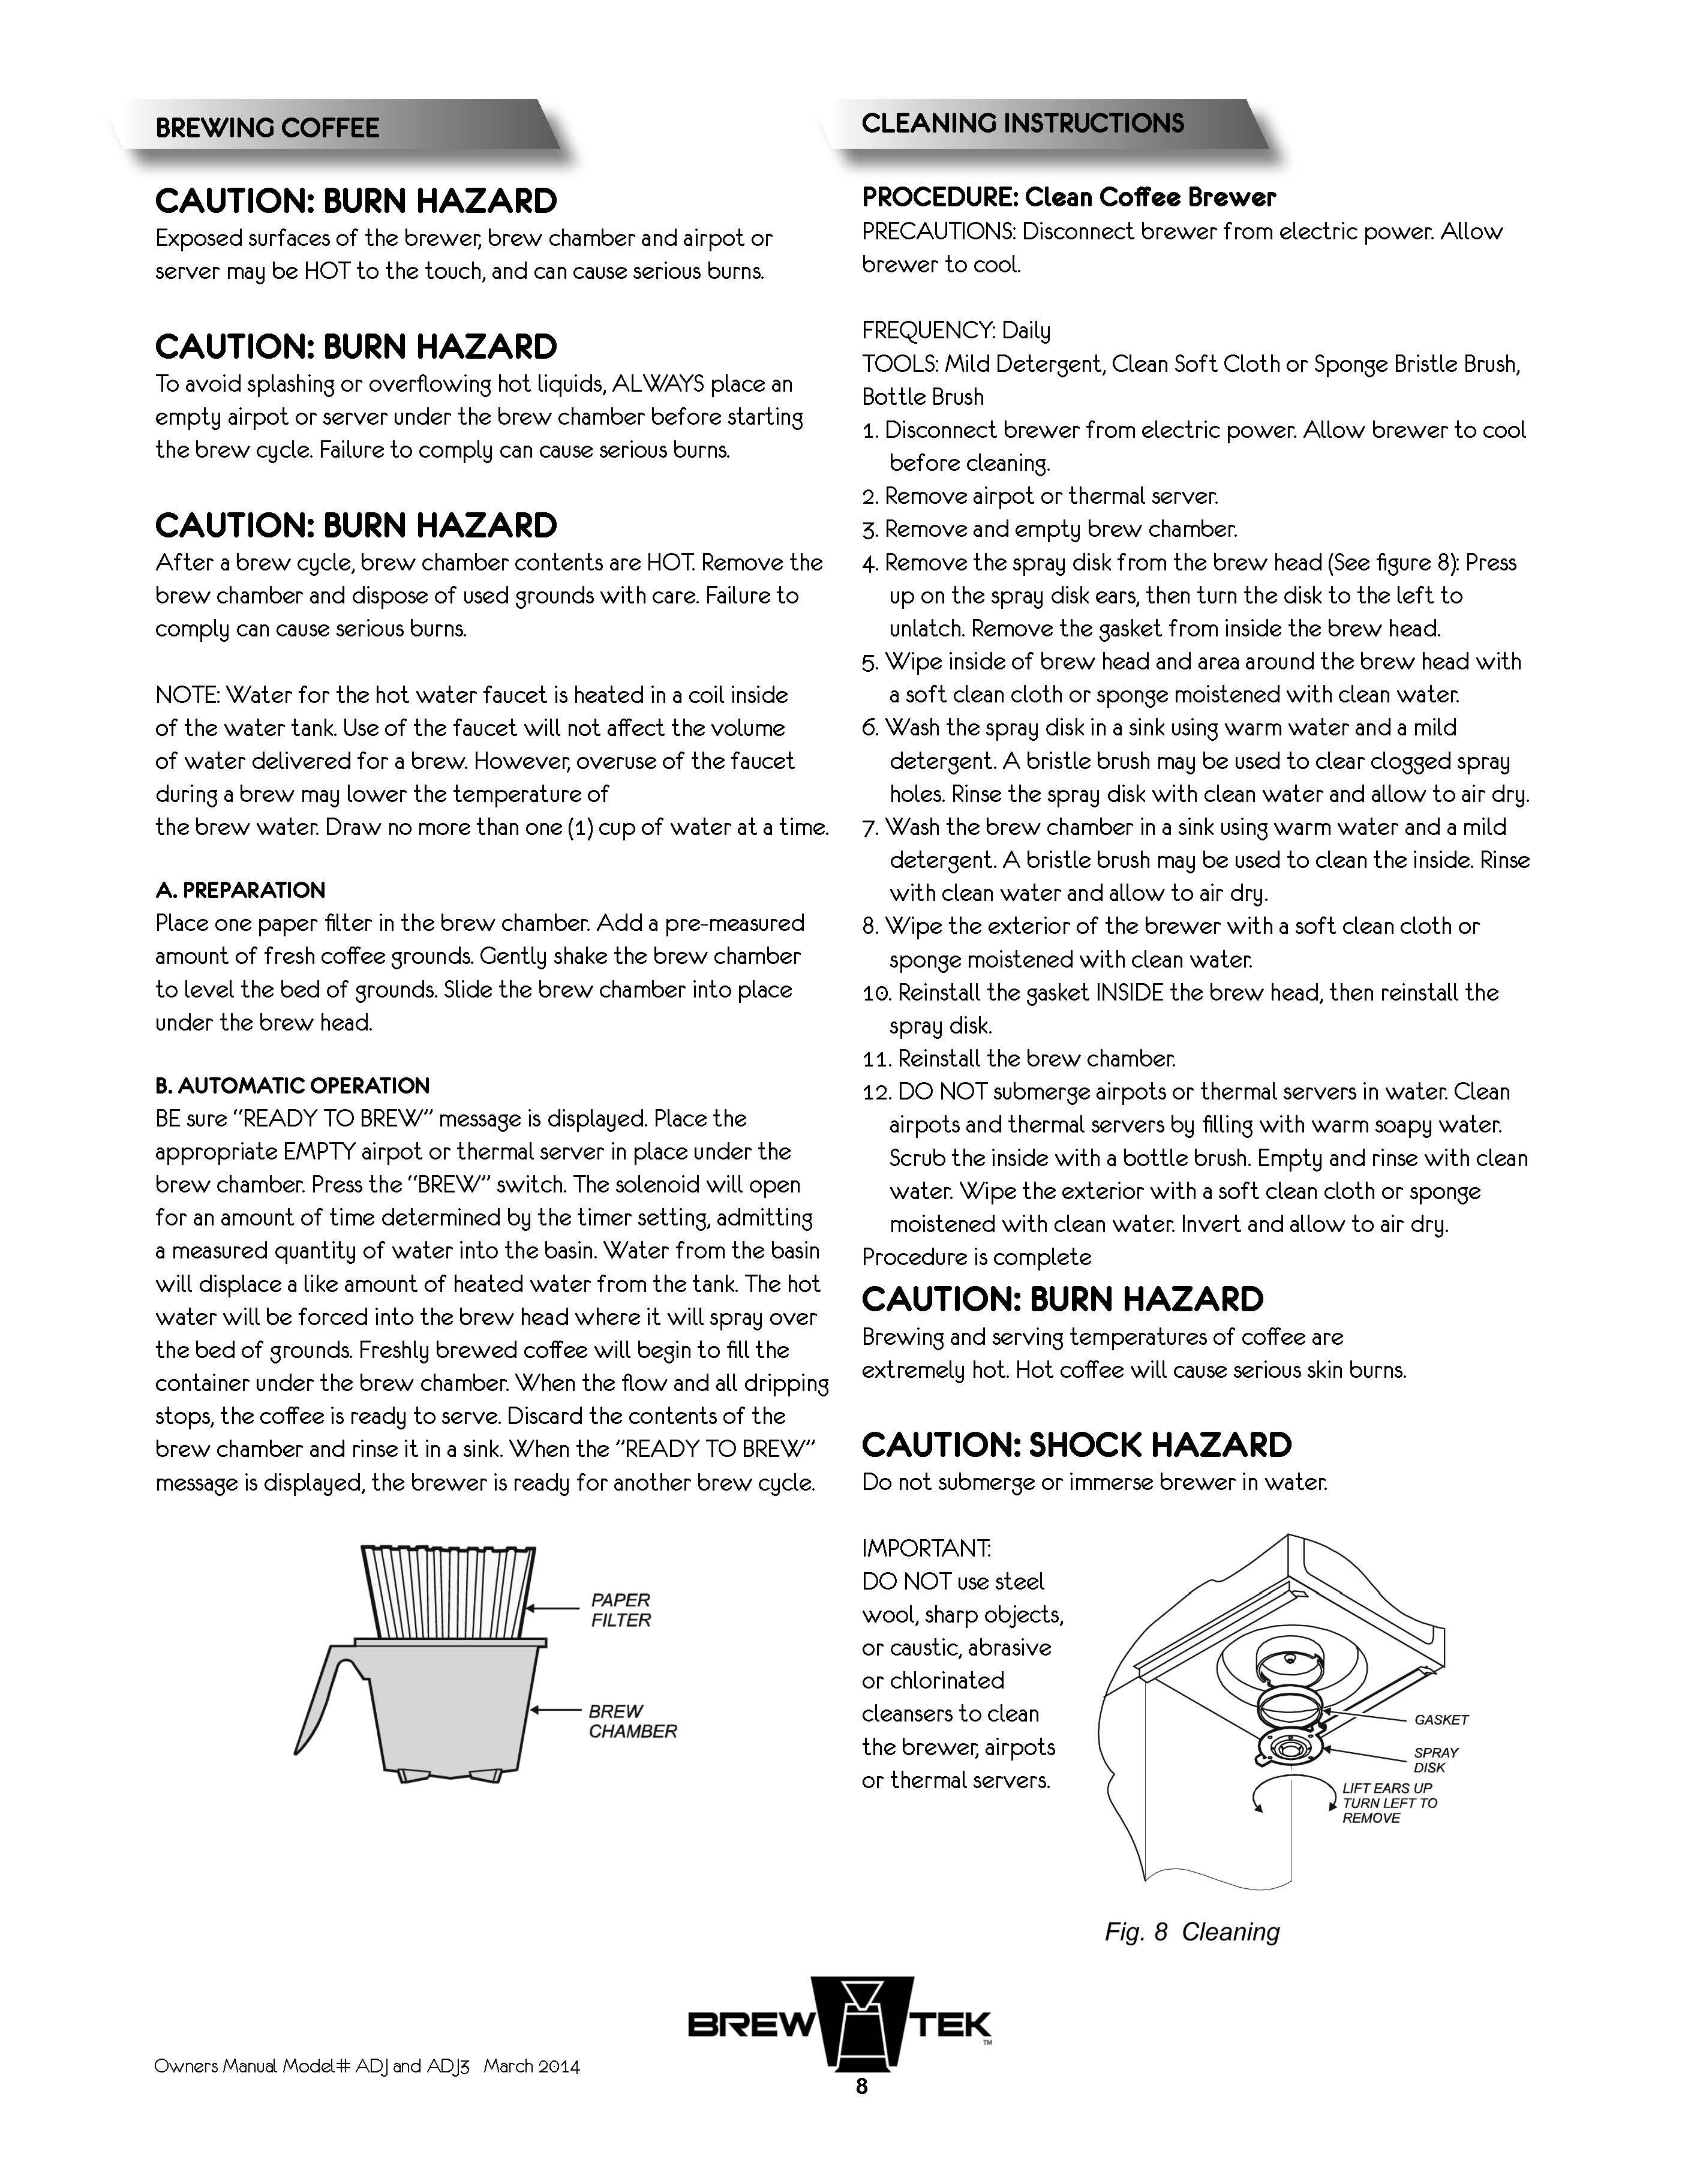 BrewTek ~ ADJ Manual